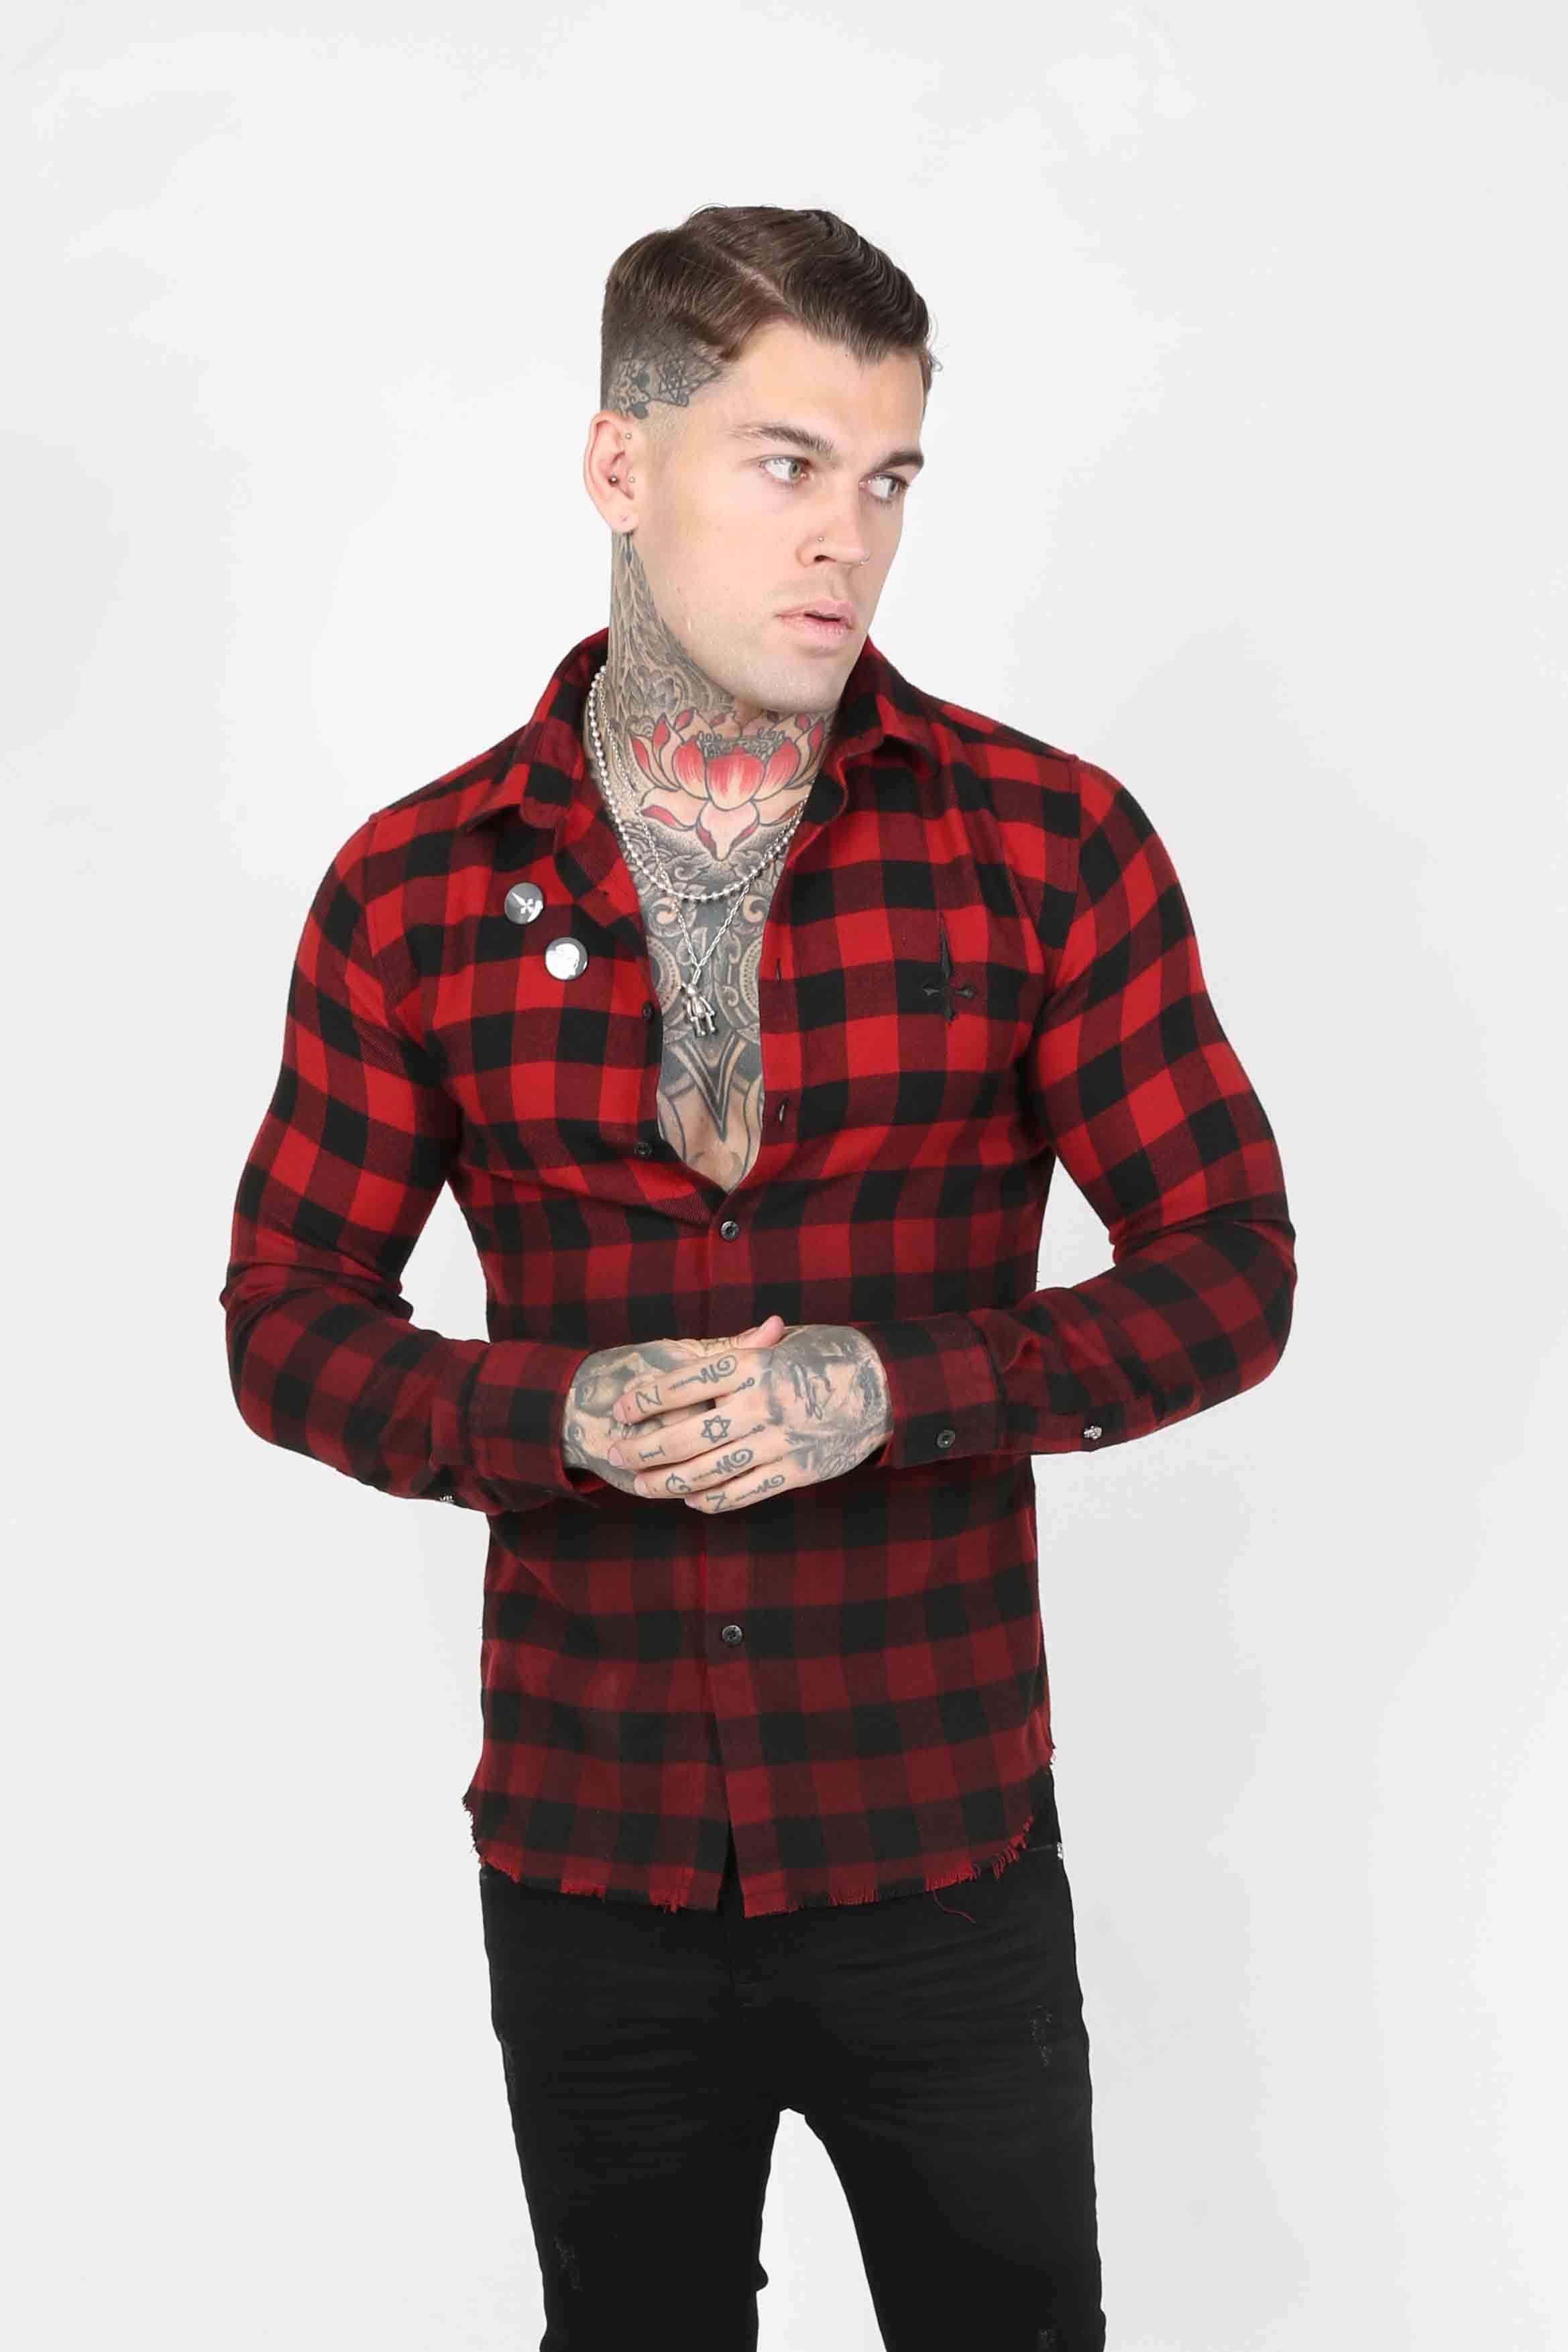 Squared Plaid Men's Shirt - Red, Small